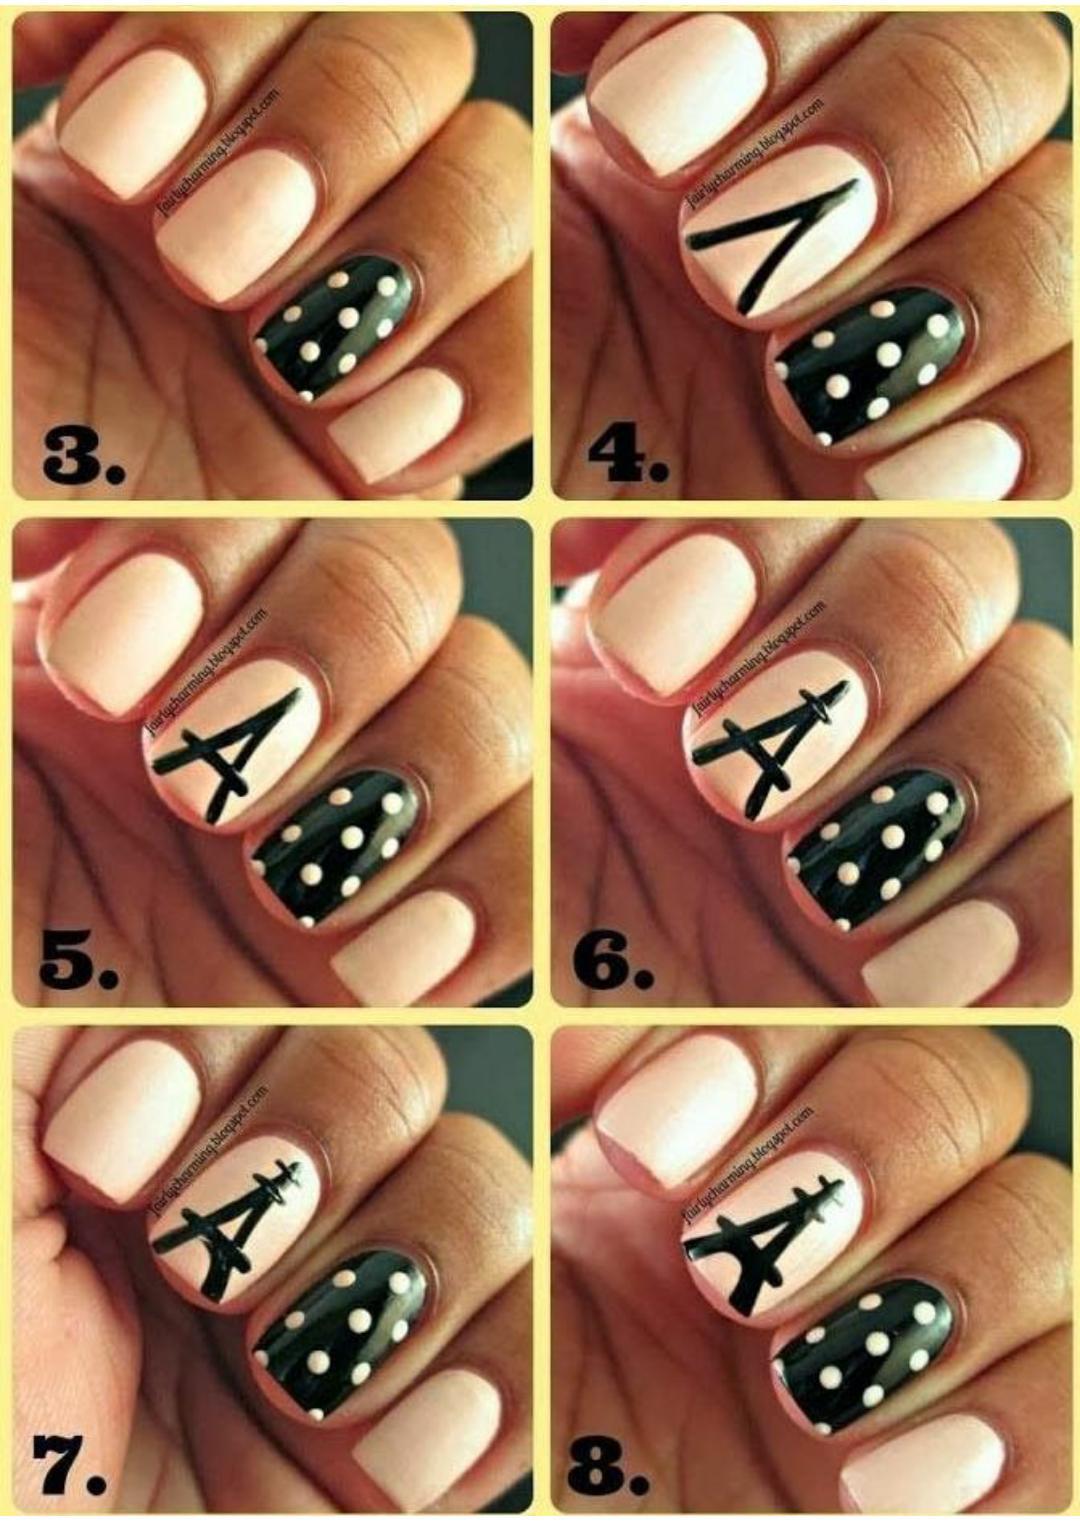 Aplikasi Collection of Nails Designs